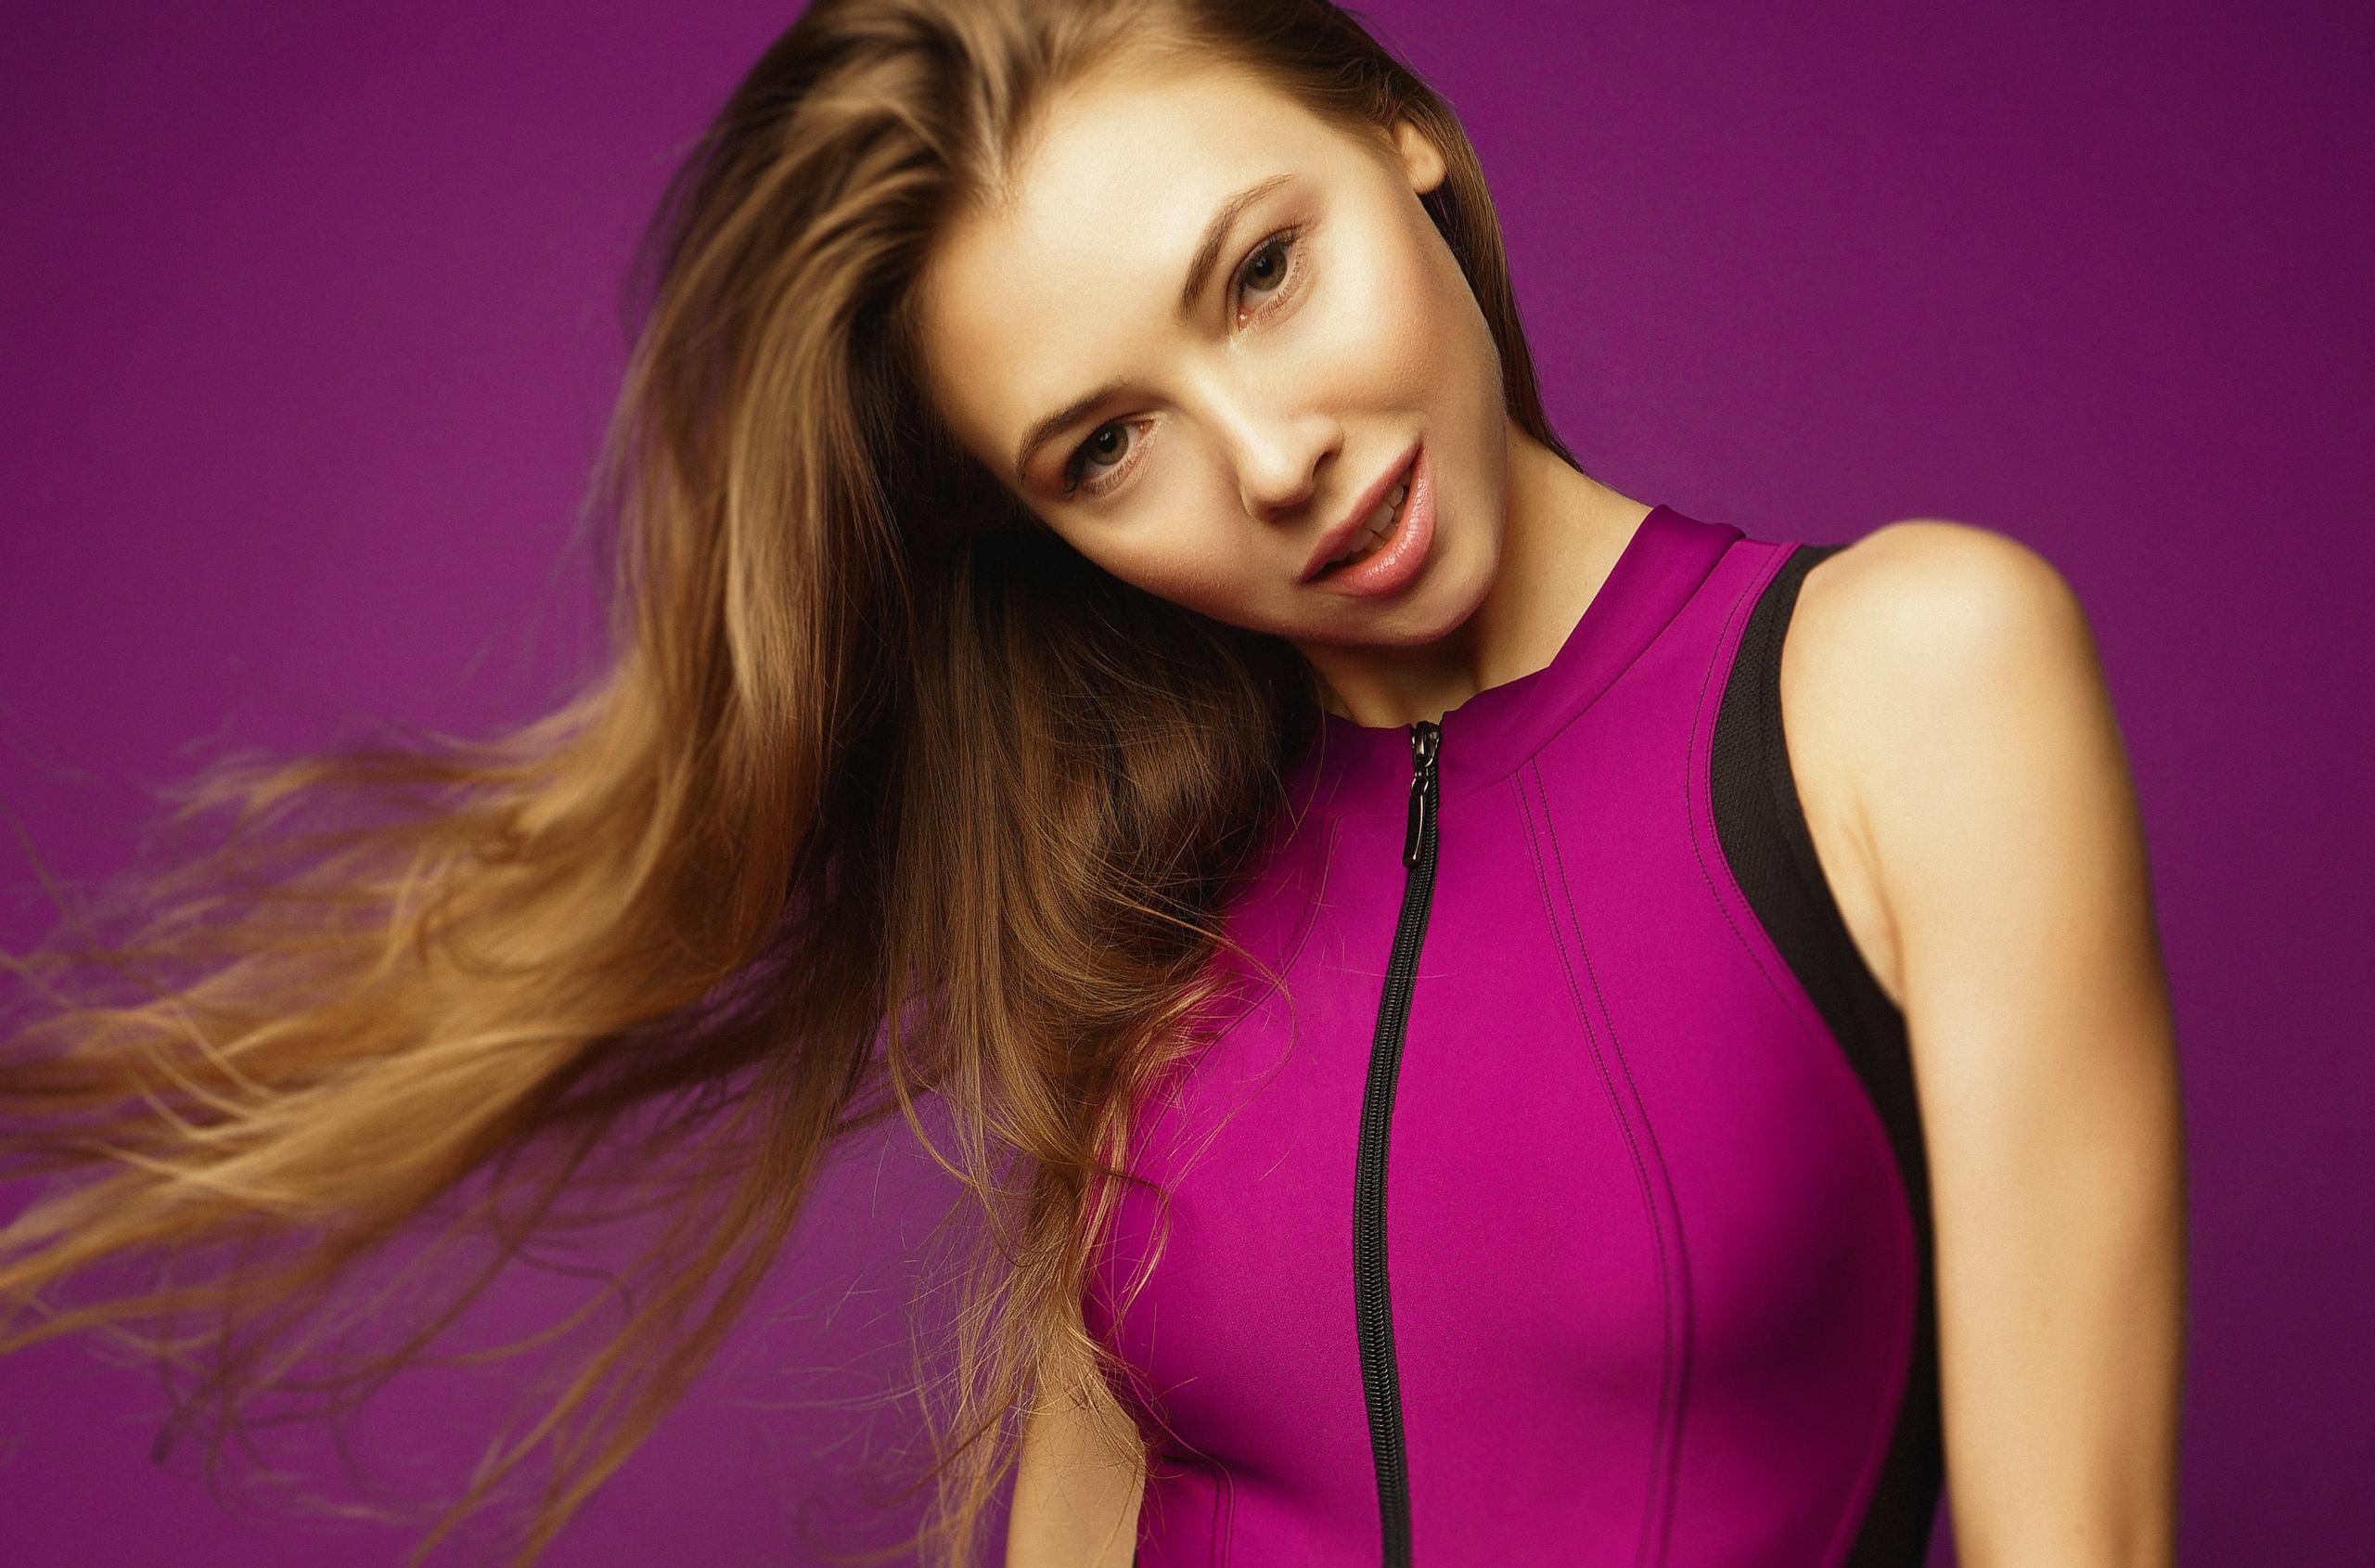 People 2560x1690 Katerina Bolinger Cute Bunny women model brunette indoors bokeh purple background purple clothing zipper zippers YFUNNY